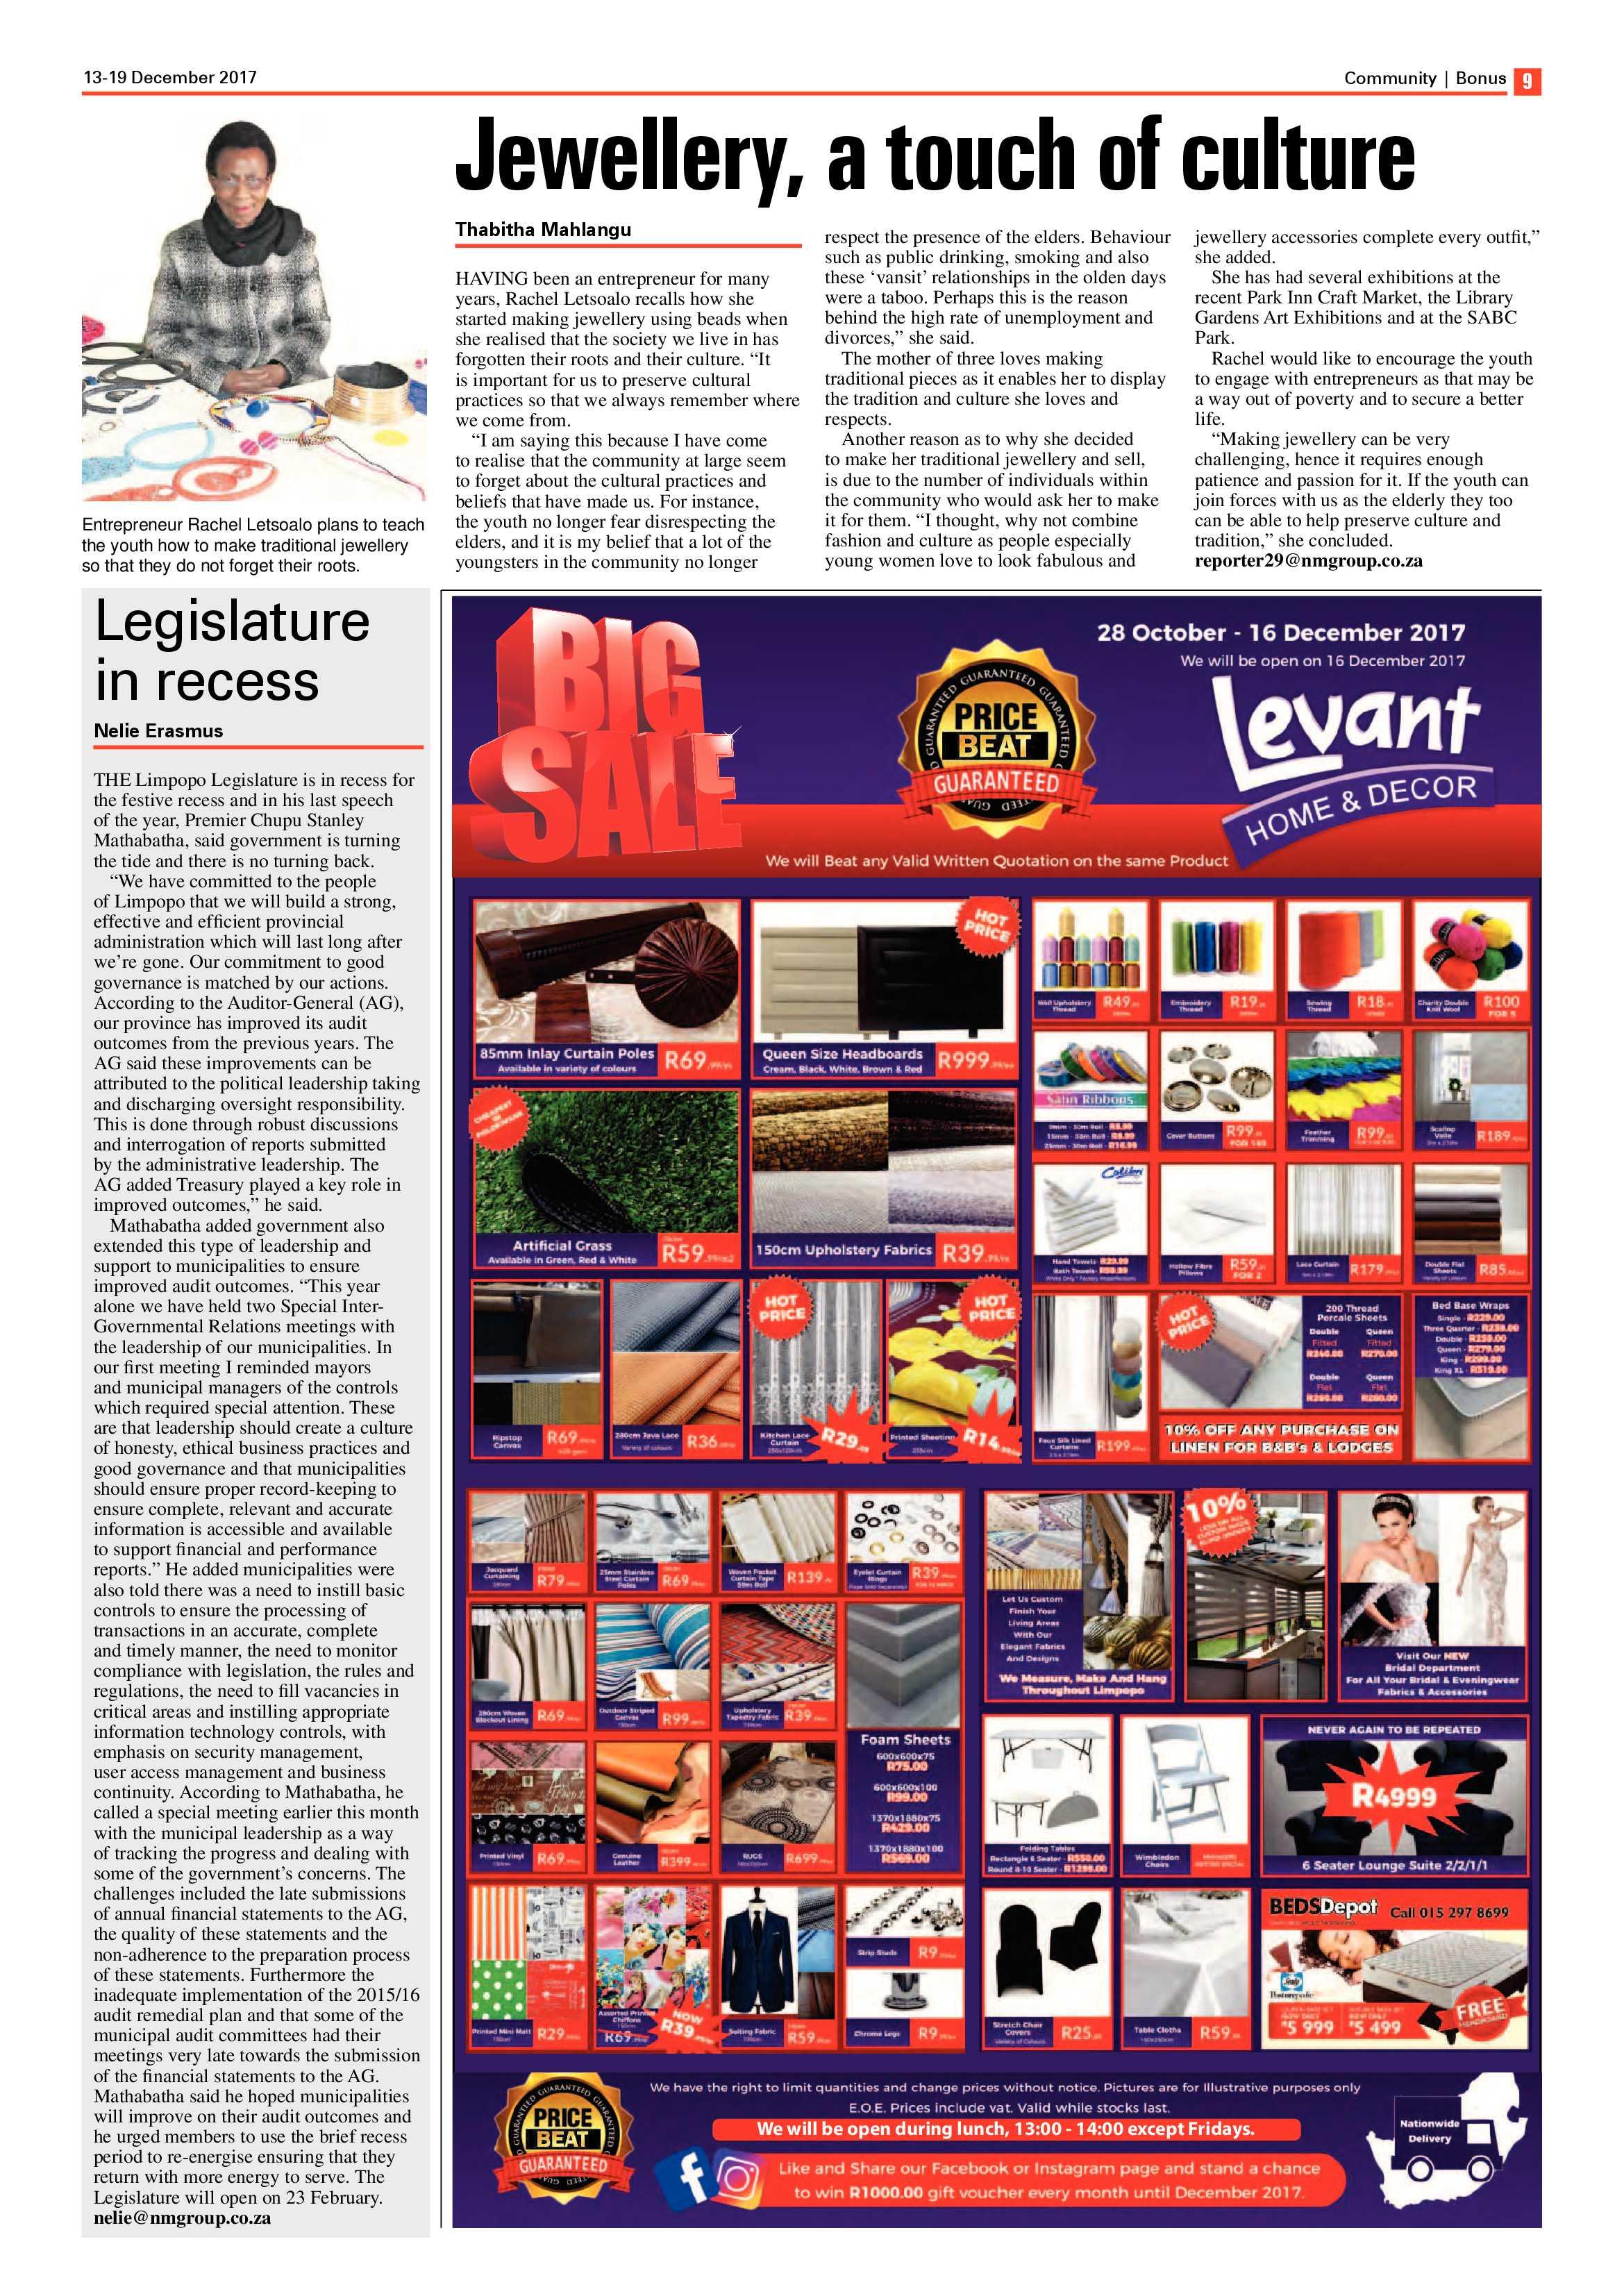 review-bonus-13-december-2017-epapers-page-9